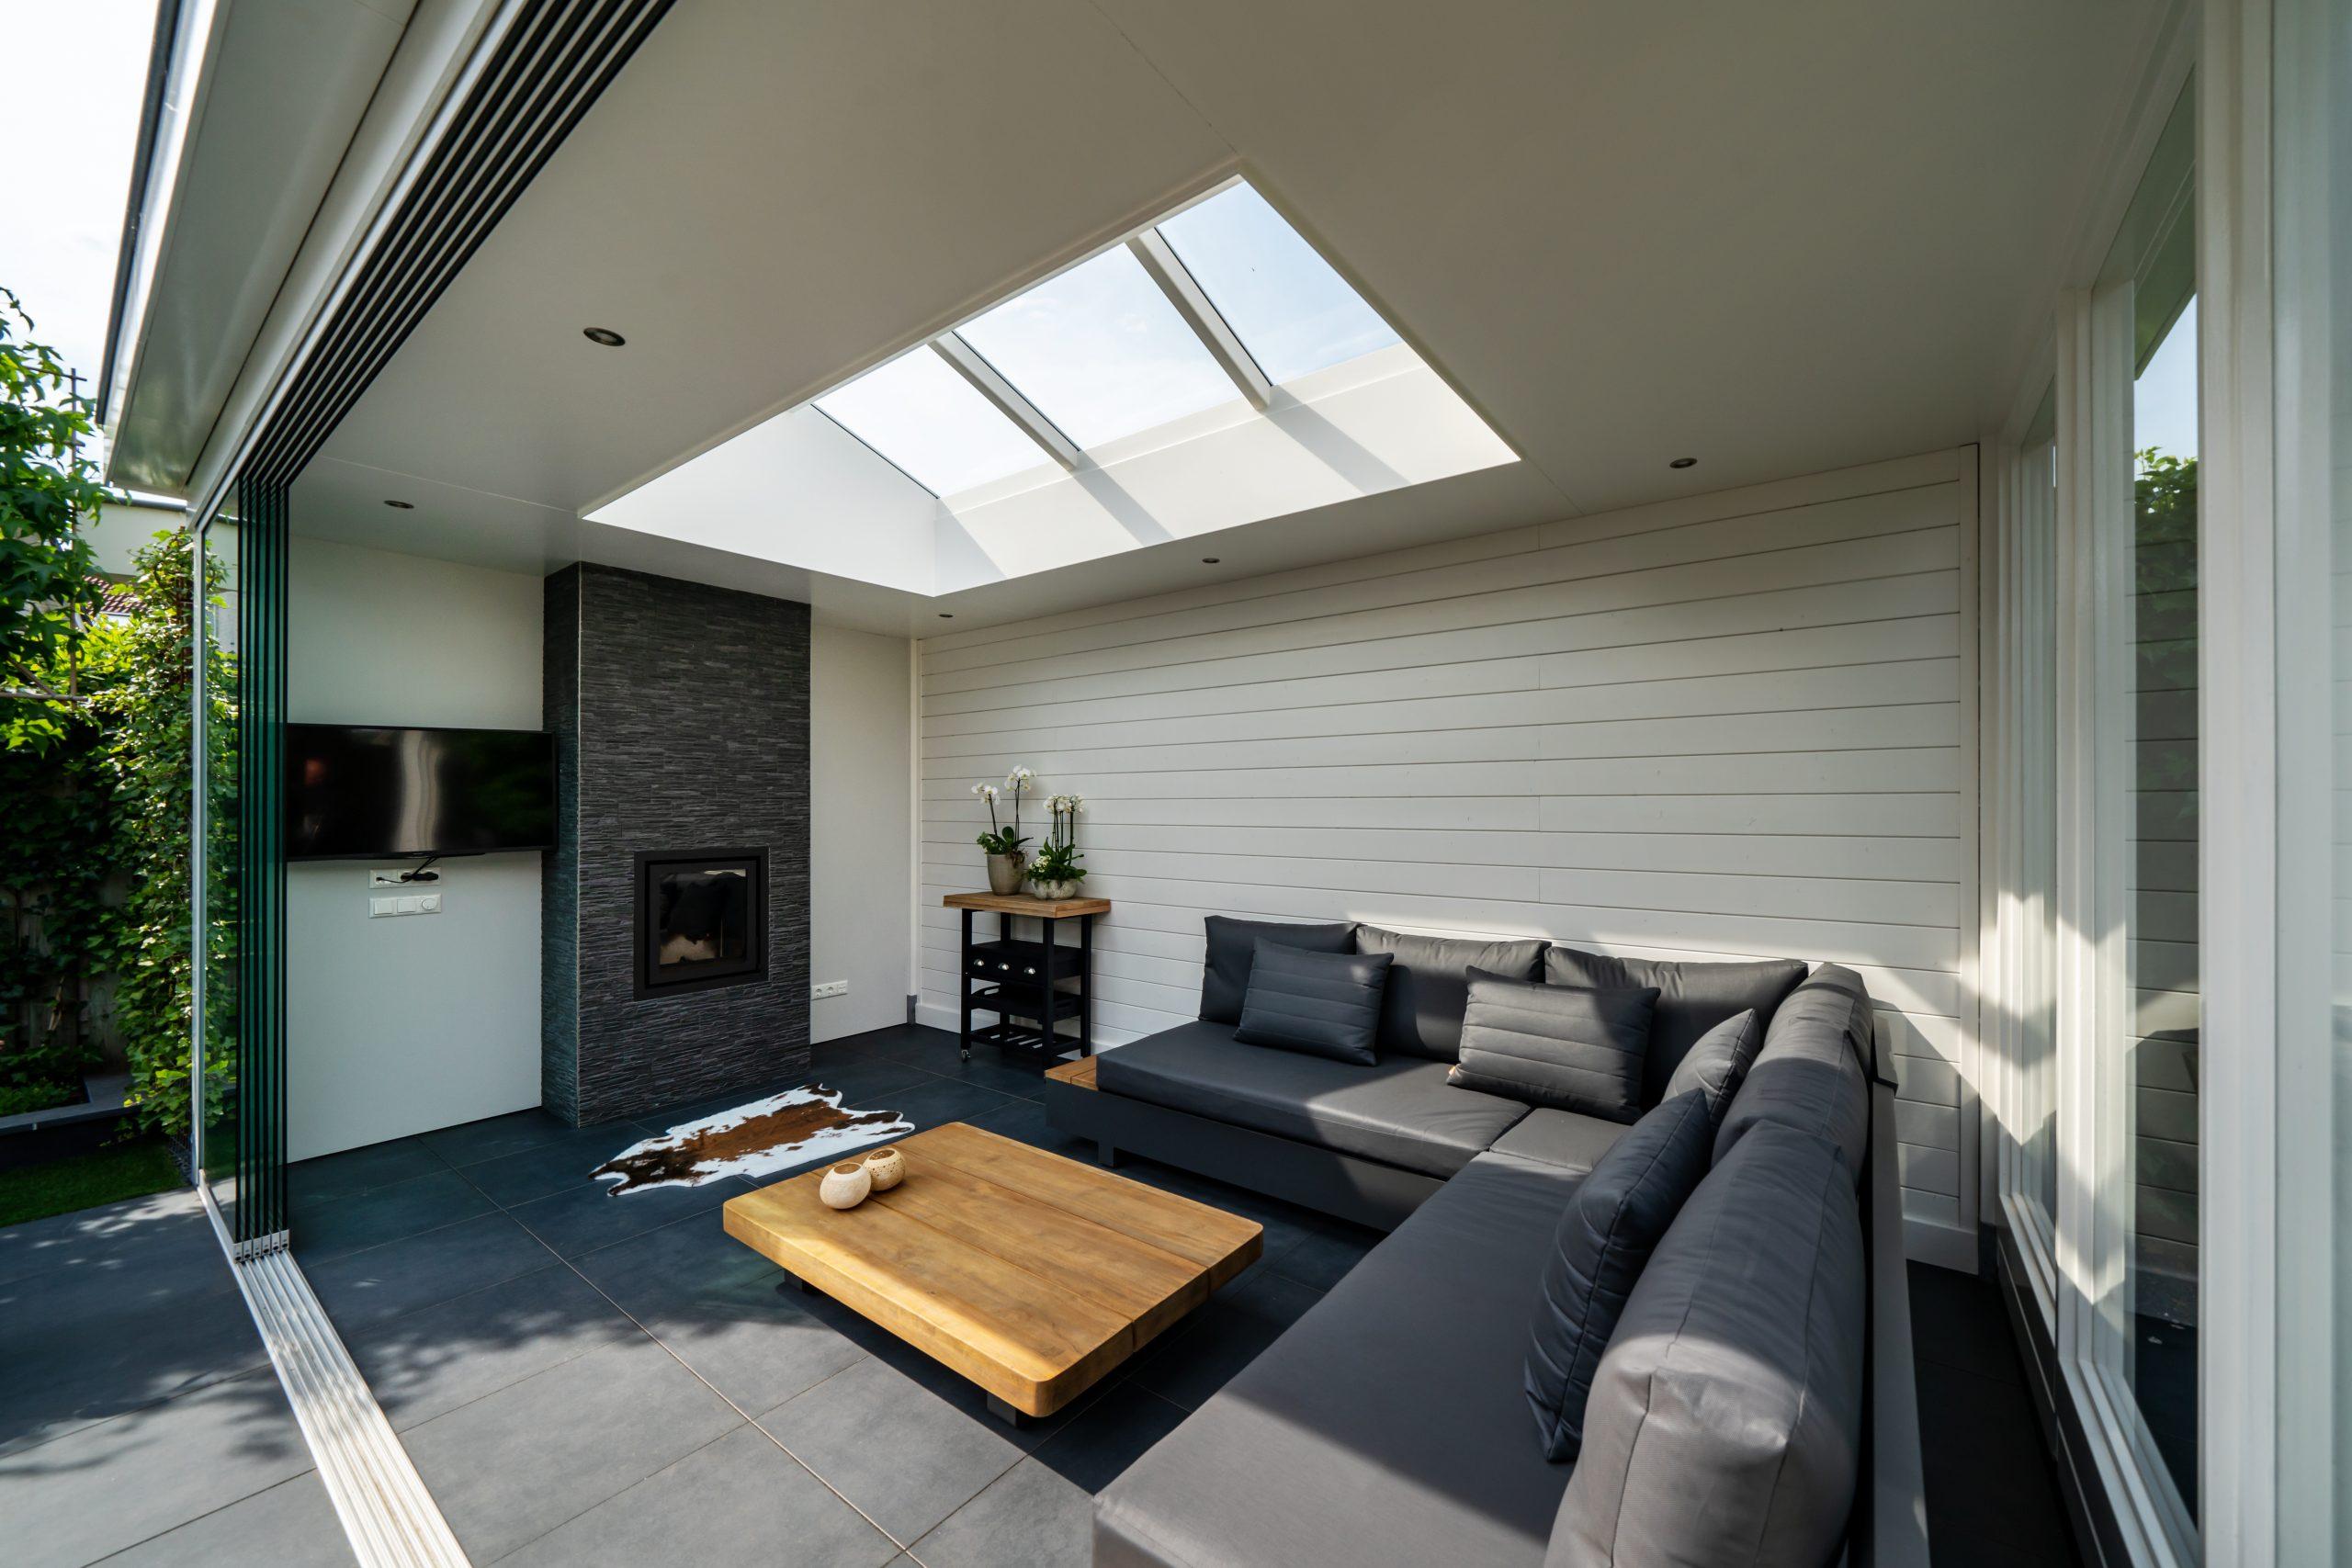 Kuppens fotografie 5081c scaled - klassieke veranda